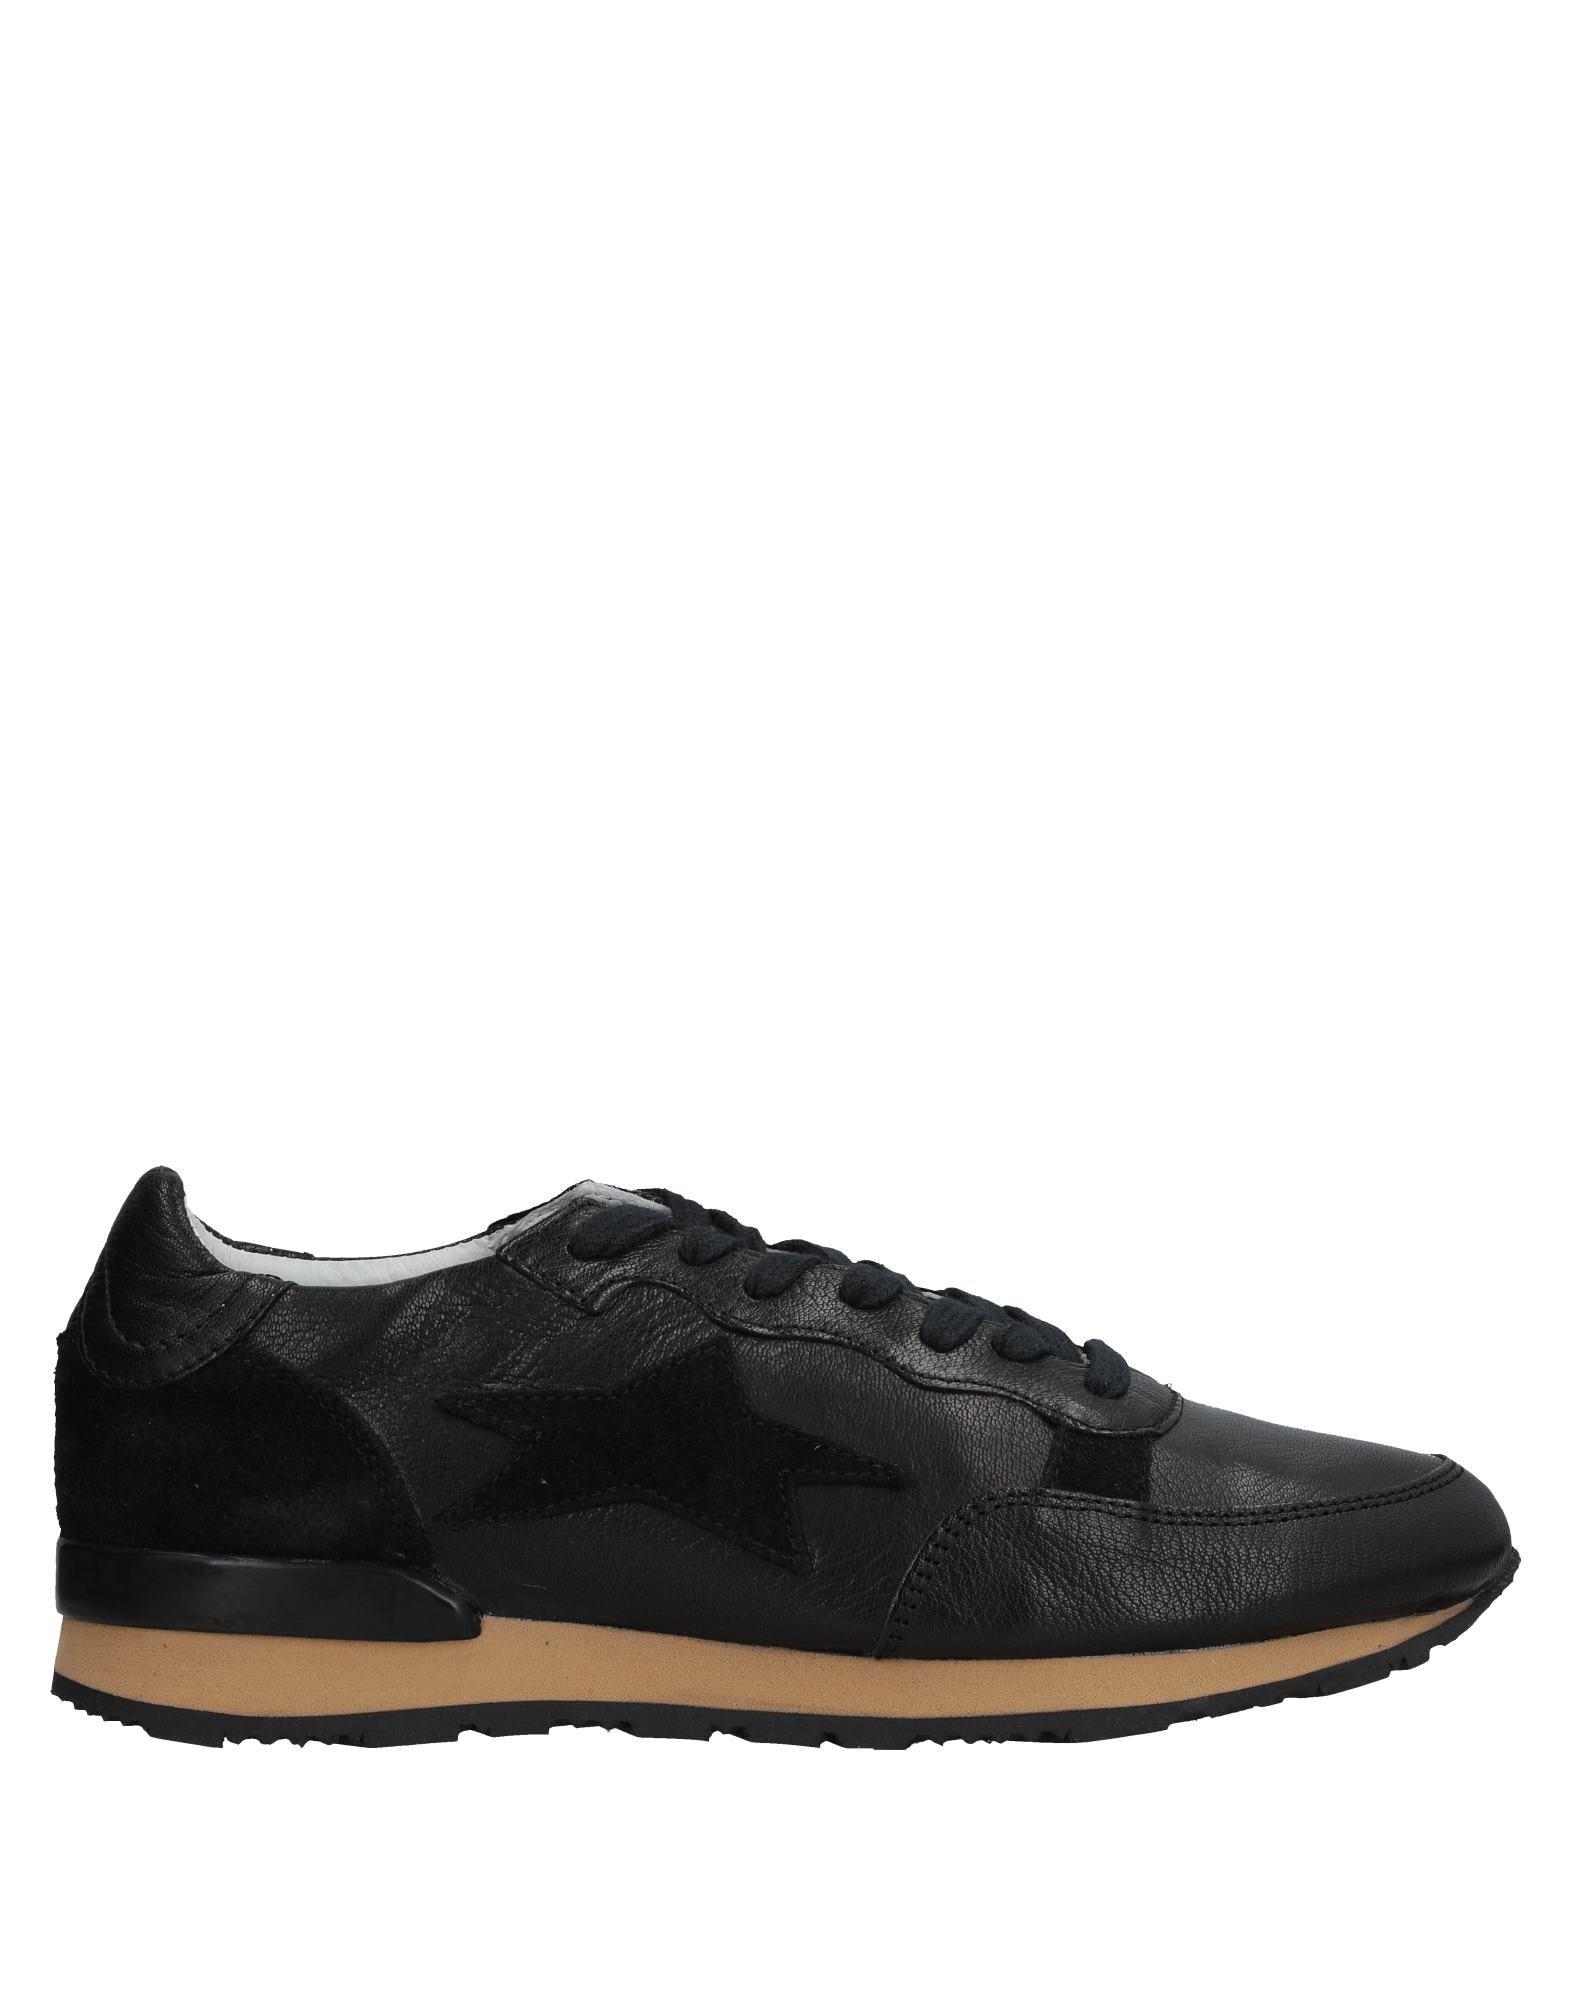 Ishikawa Sneakers 11523772UK Herren  11523772UK Sneakers Heiße Schuhe 92eb61